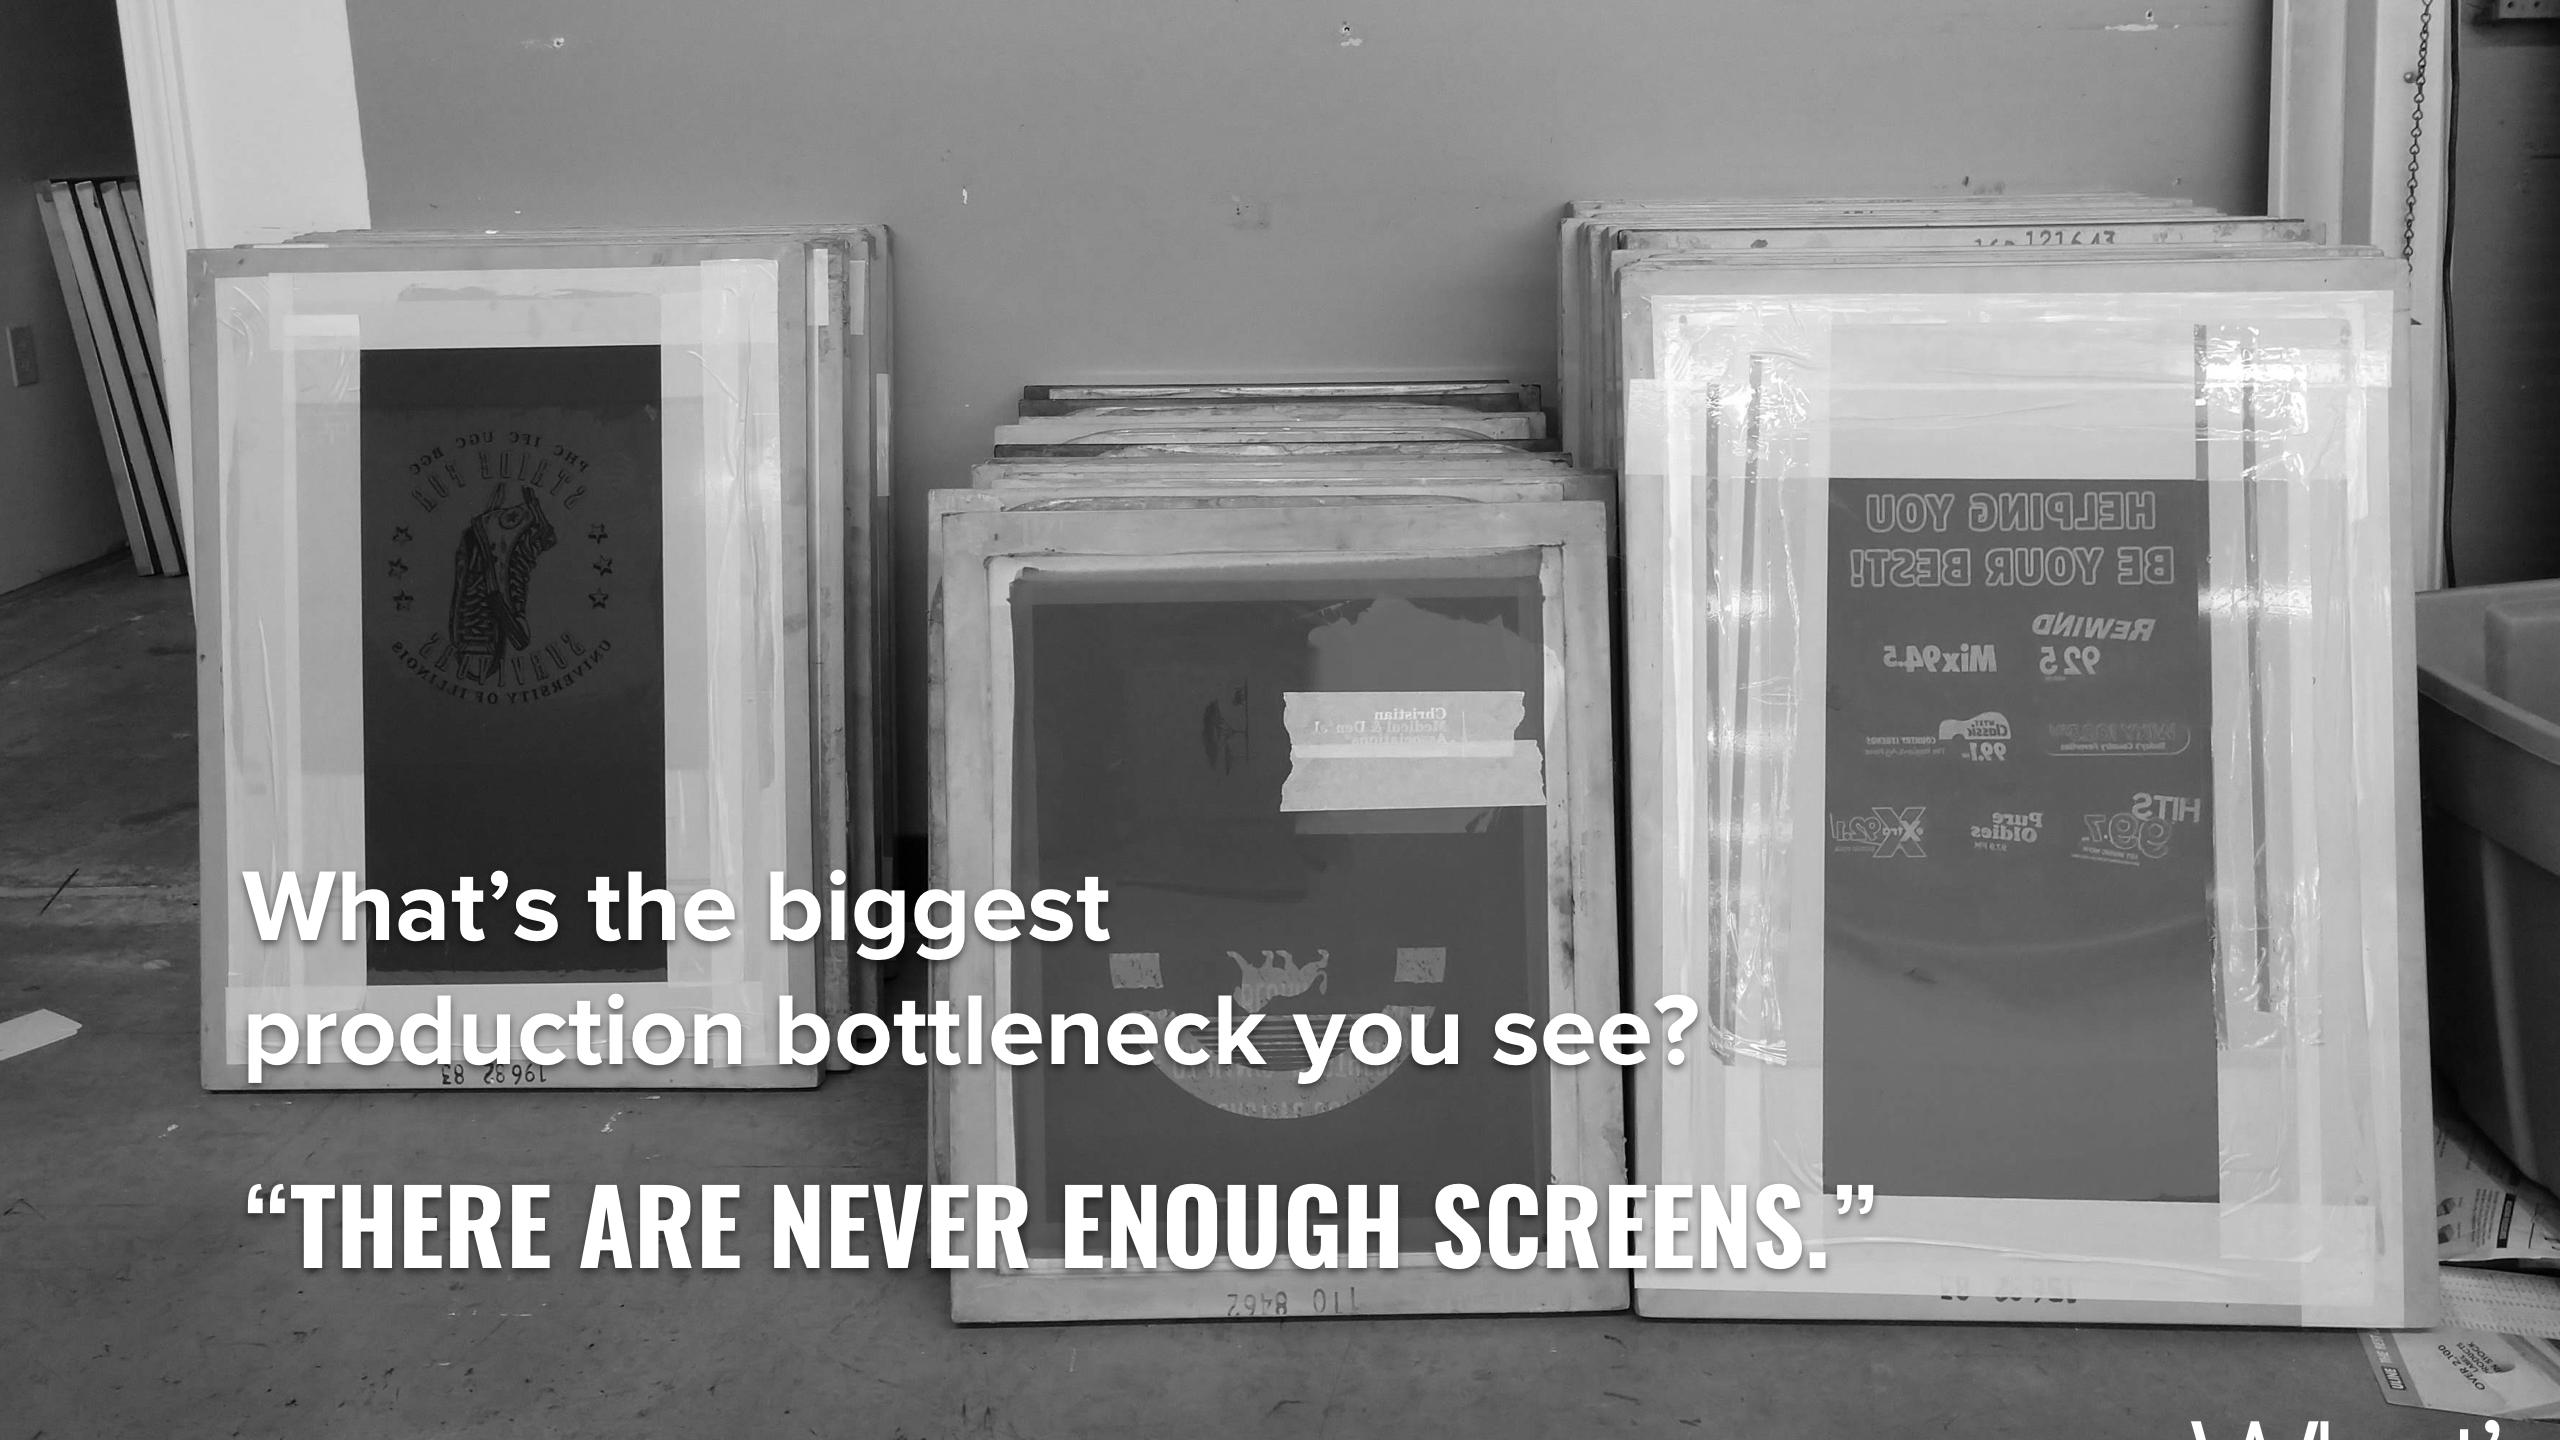 Screens for screen printing waiting for reclaim